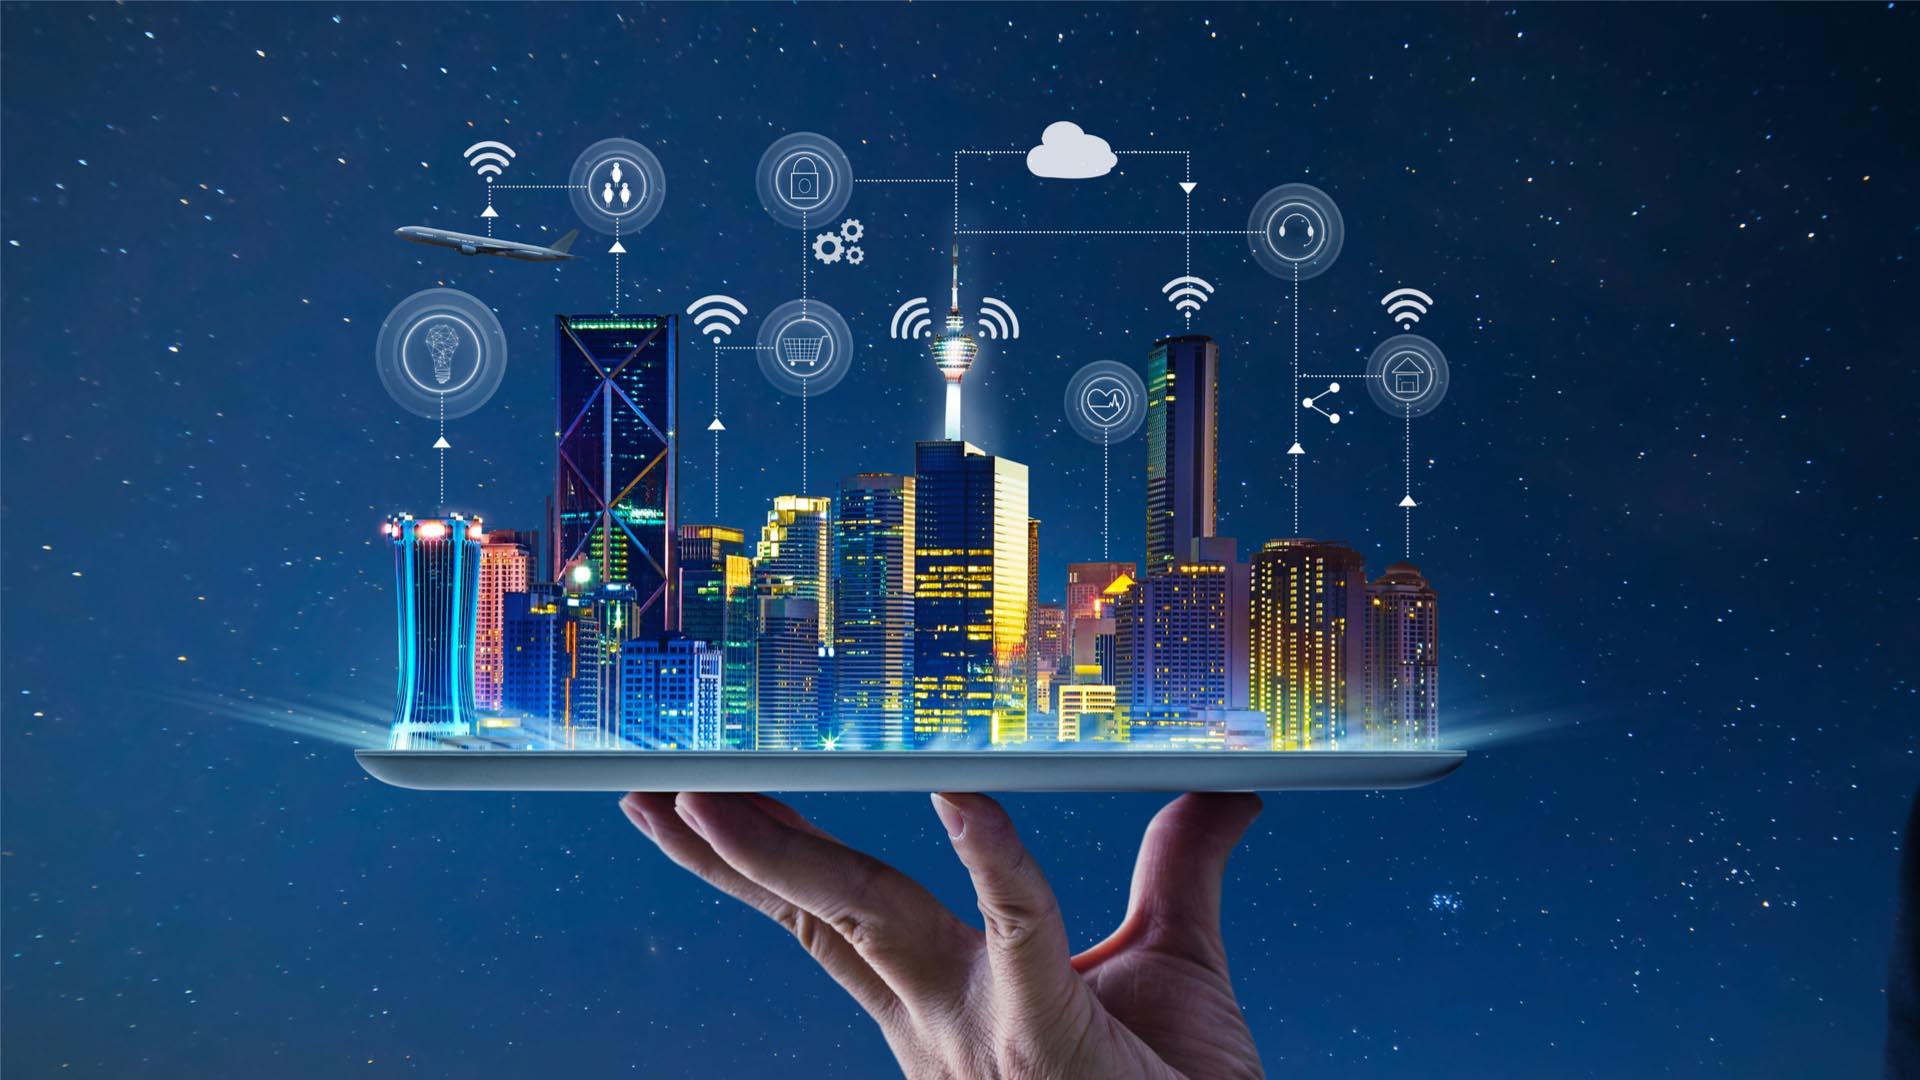 Webinar: Un New Deal Digitale per la crescita intelligente delle nostre città